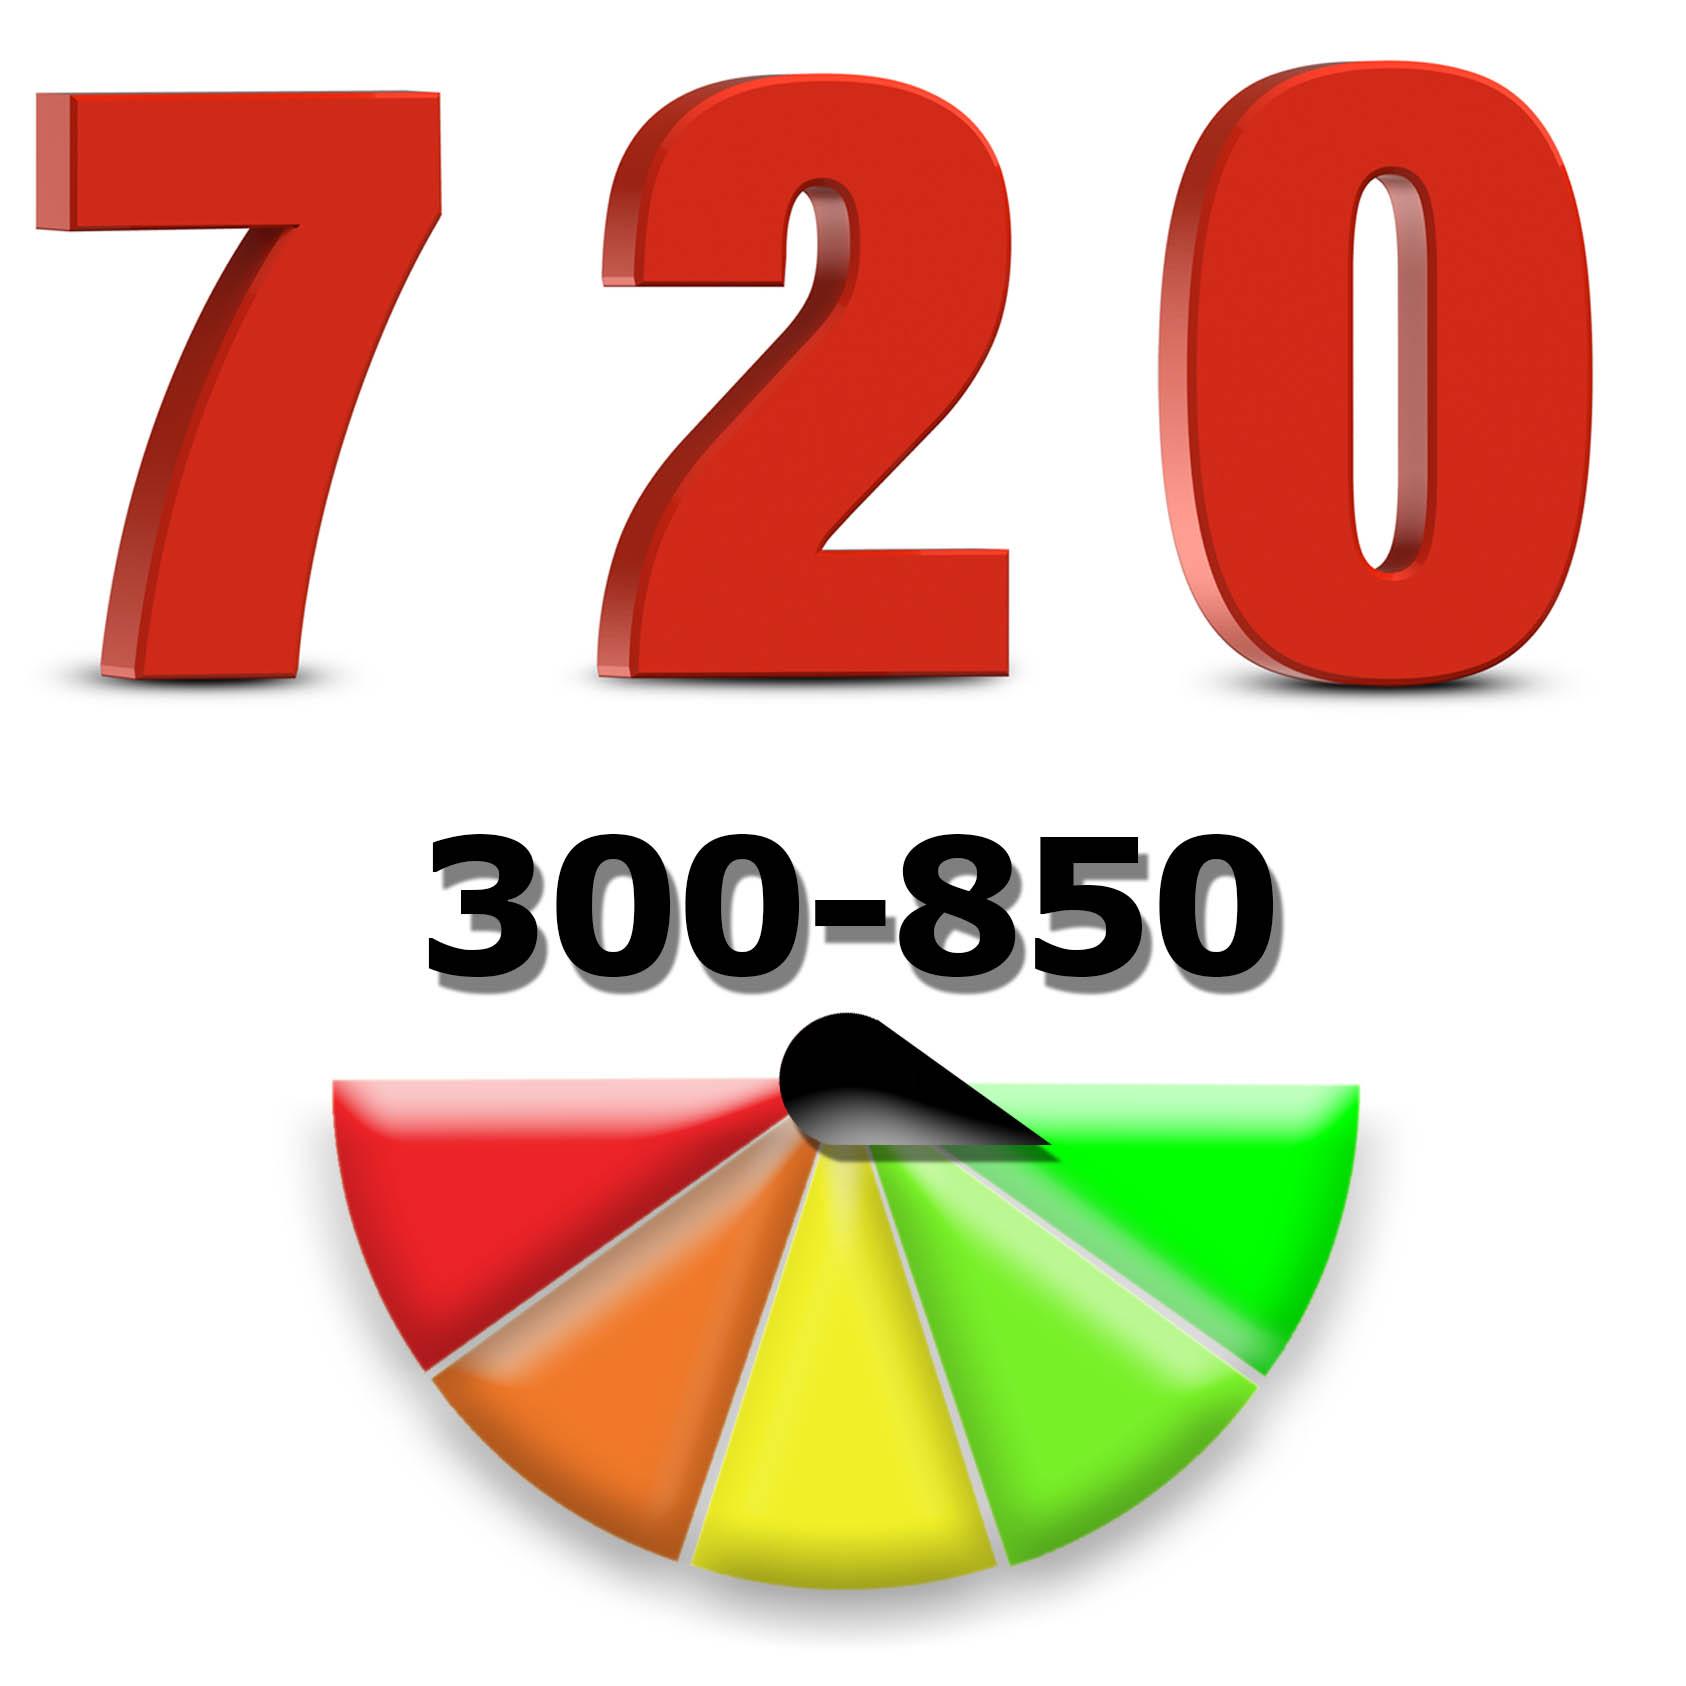 720 Credit Score >> 720 Score National Debt Law